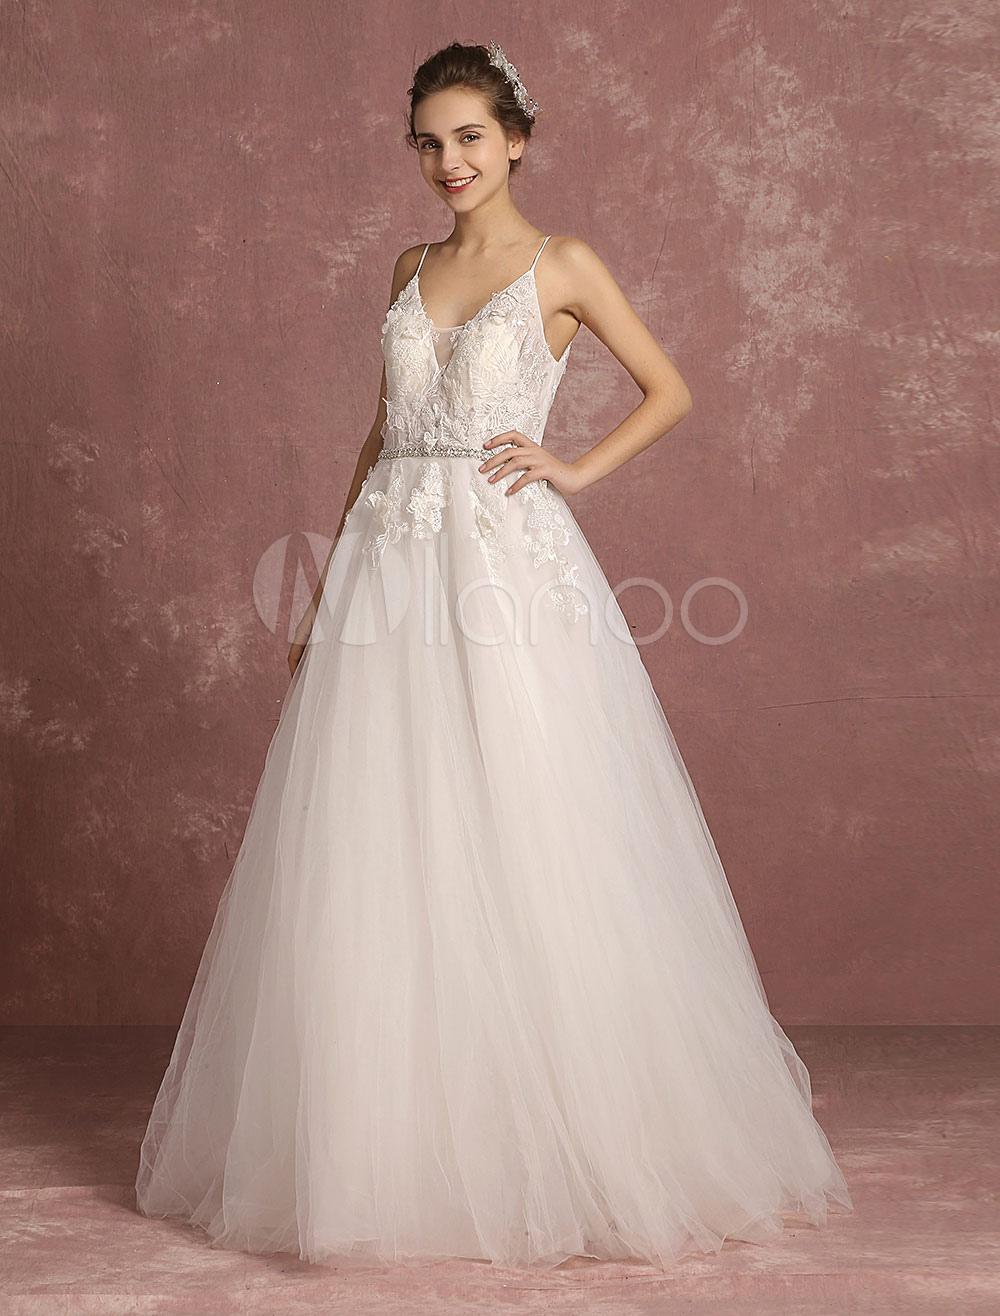 Summer Wedding Dresses 2018 Boho Lace Flowers Applique Tulle Bridal Gown A Line Beaded Sash Spaghetti Straps Floor Length Bridal Dress